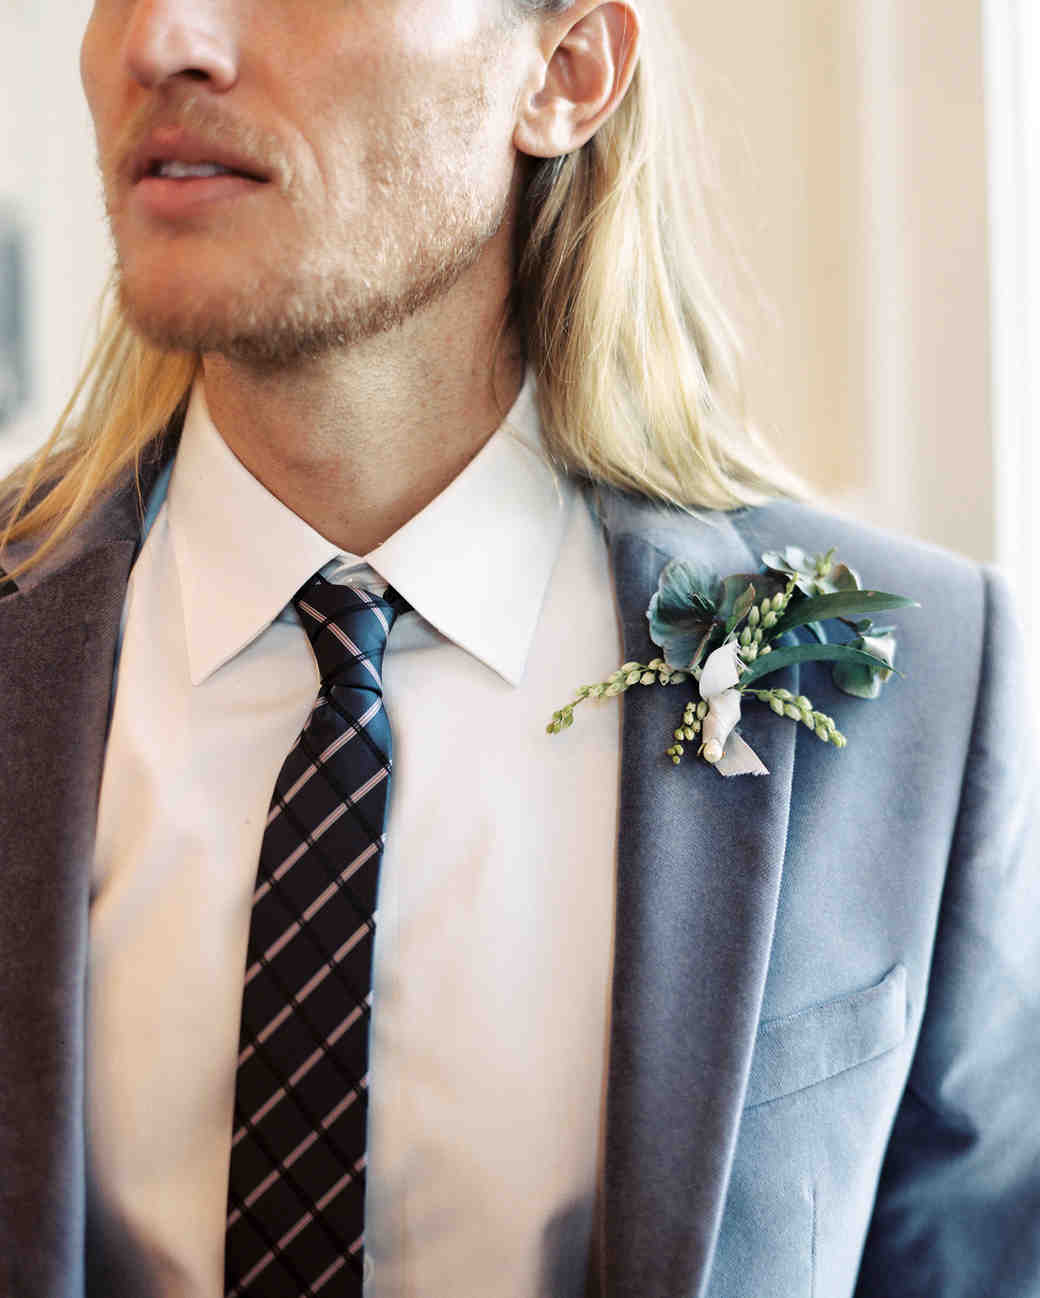 rachel-tyson-wedding-boutonniere-056-s112158-0915.jpg